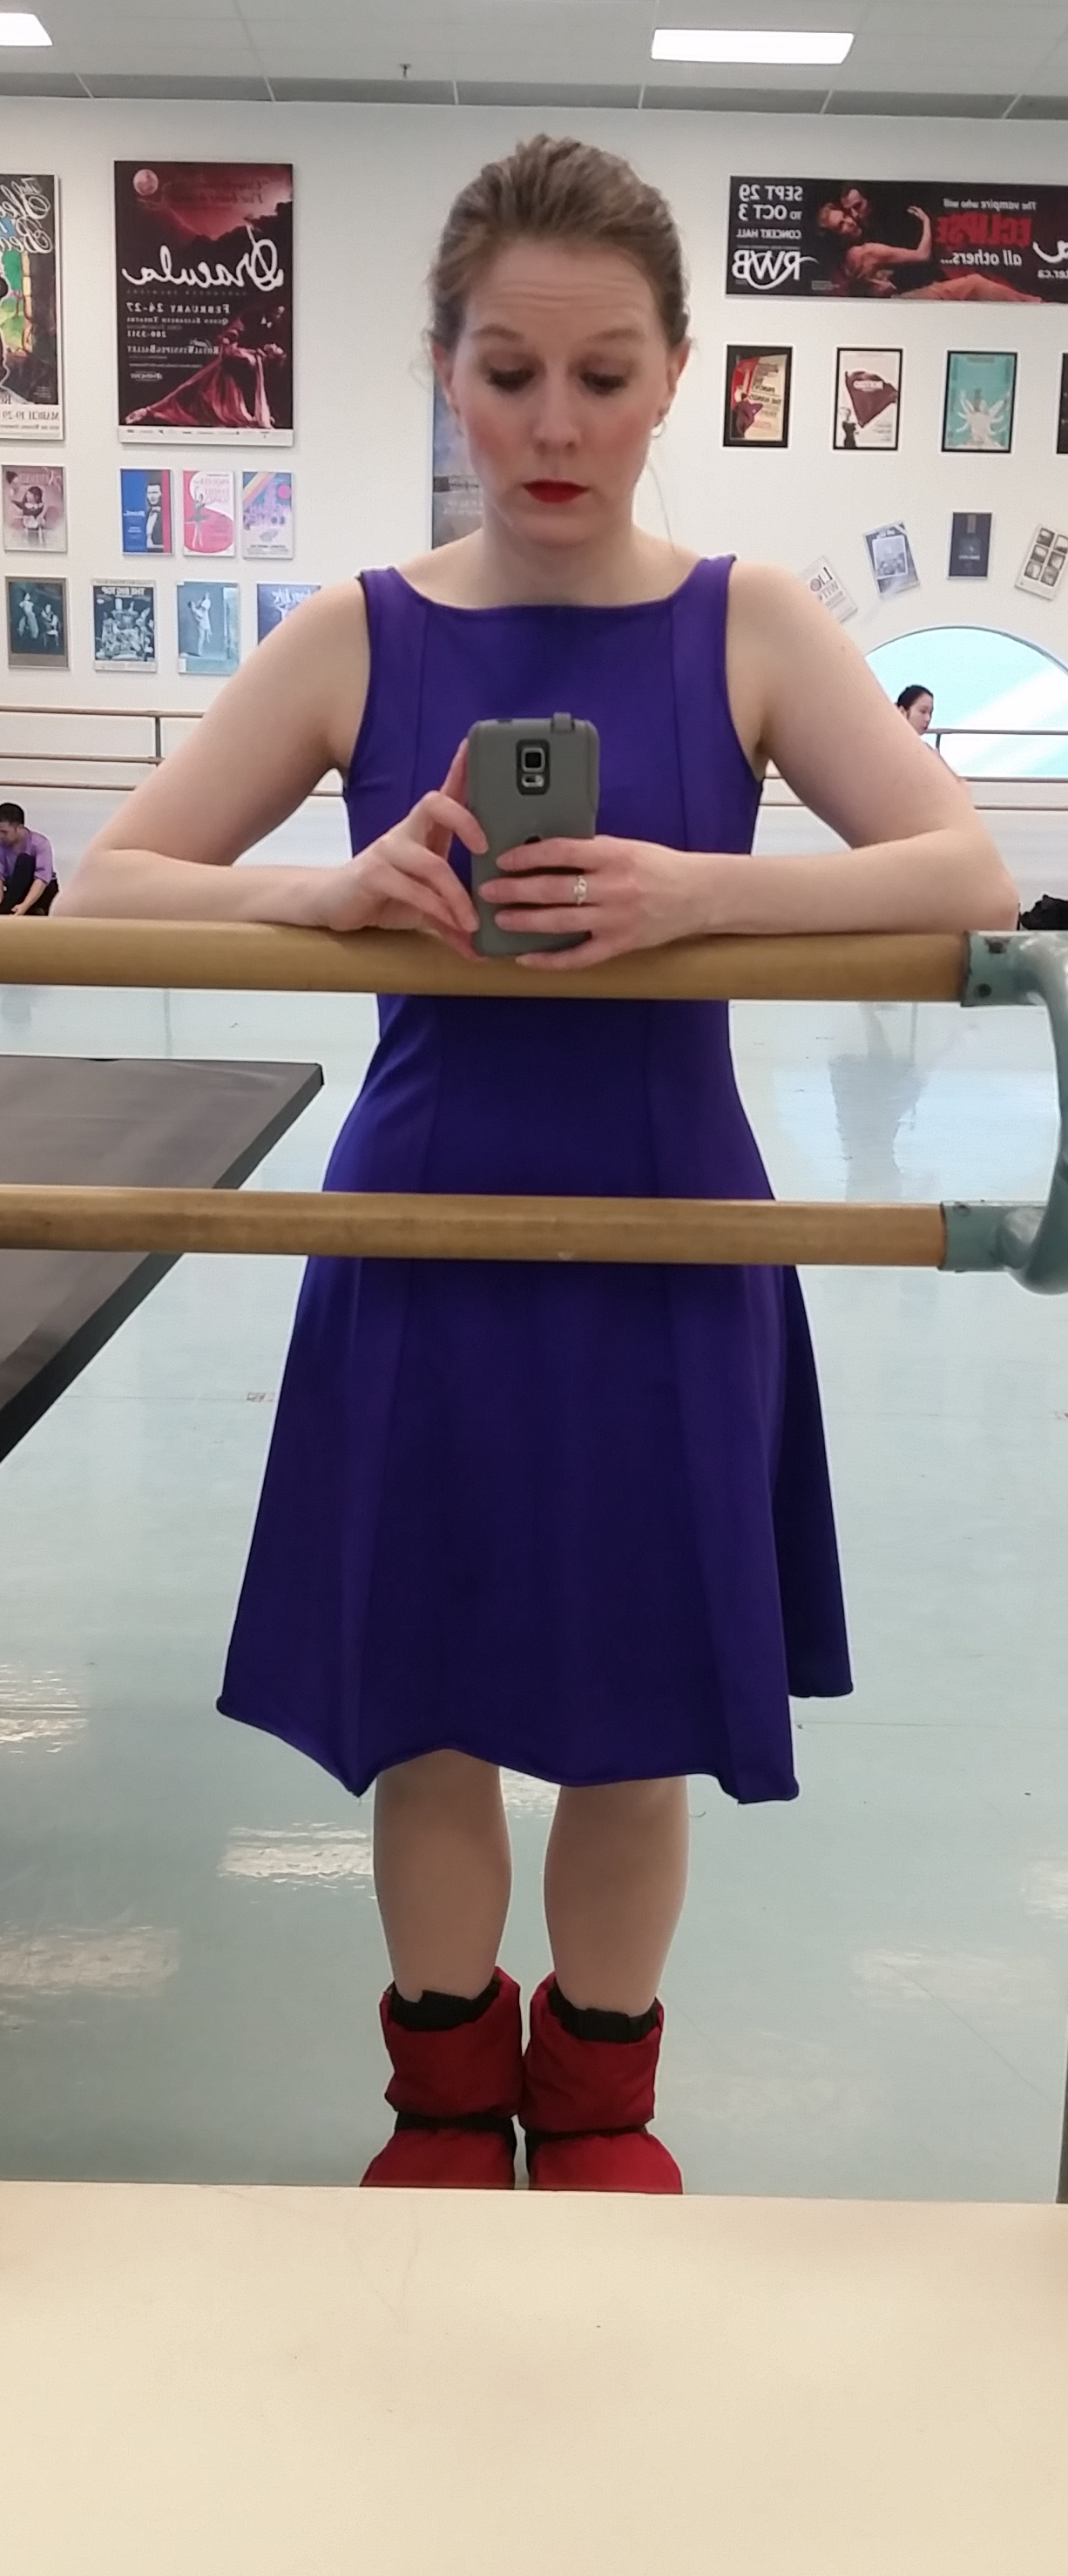 Dress Rehearsal Portrait.jpeg